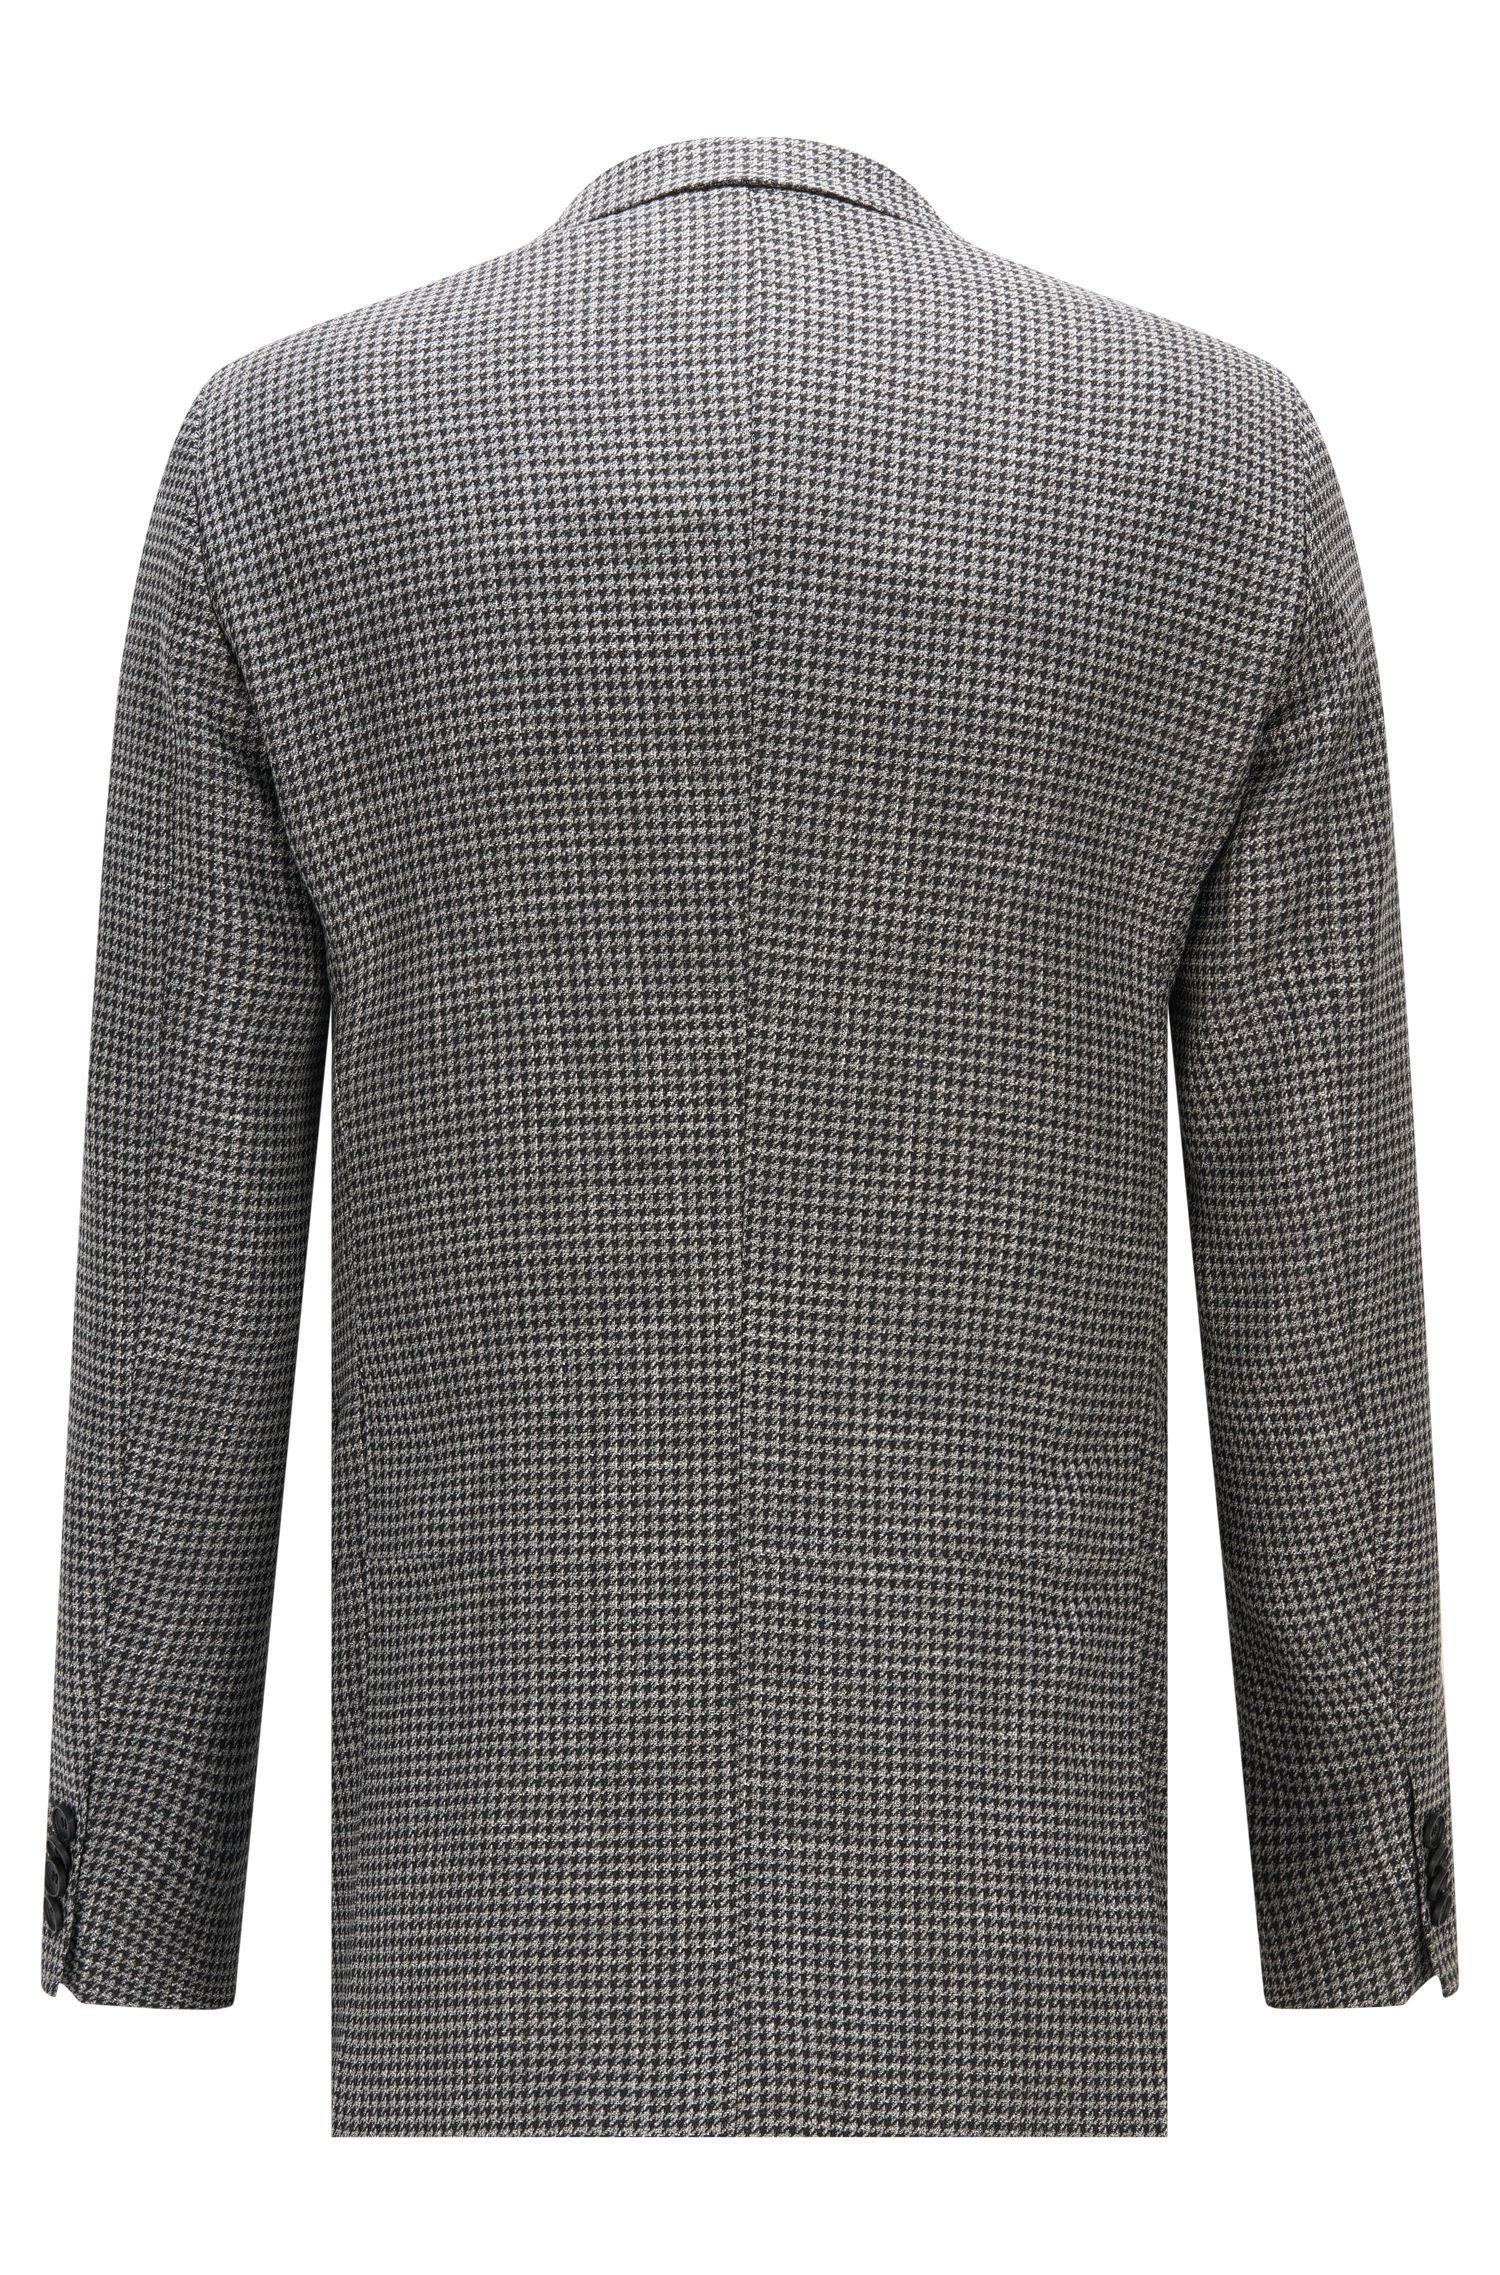 Houndstooth Stretch Virgin Wool Sport Coat, Extra Slim Fit   Roan